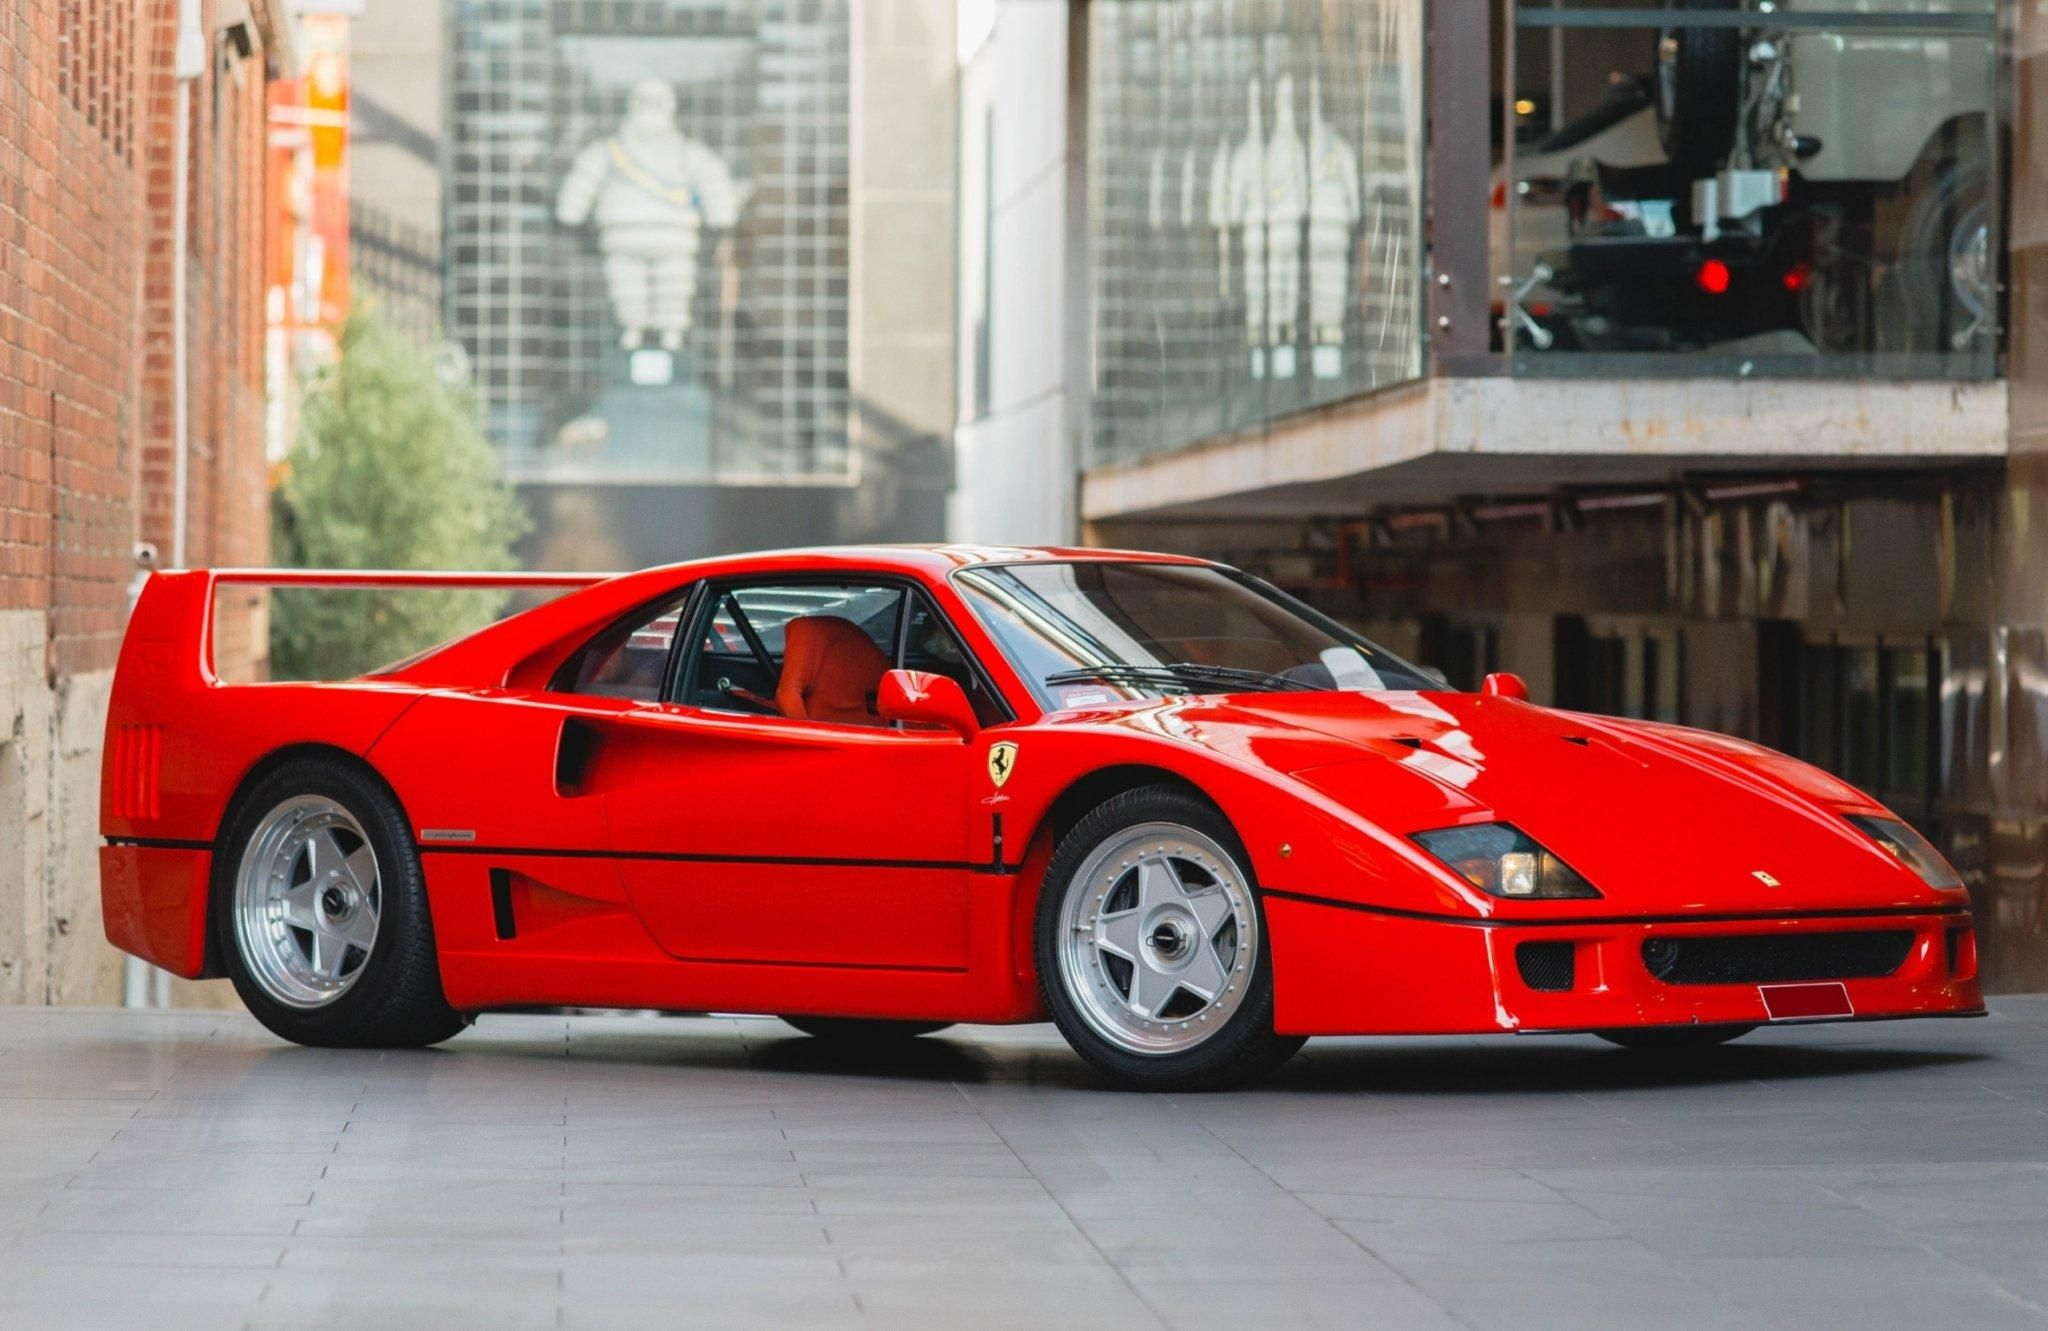 1989 Ferrari F40 Ferrari F40 Ferrari Sports Car